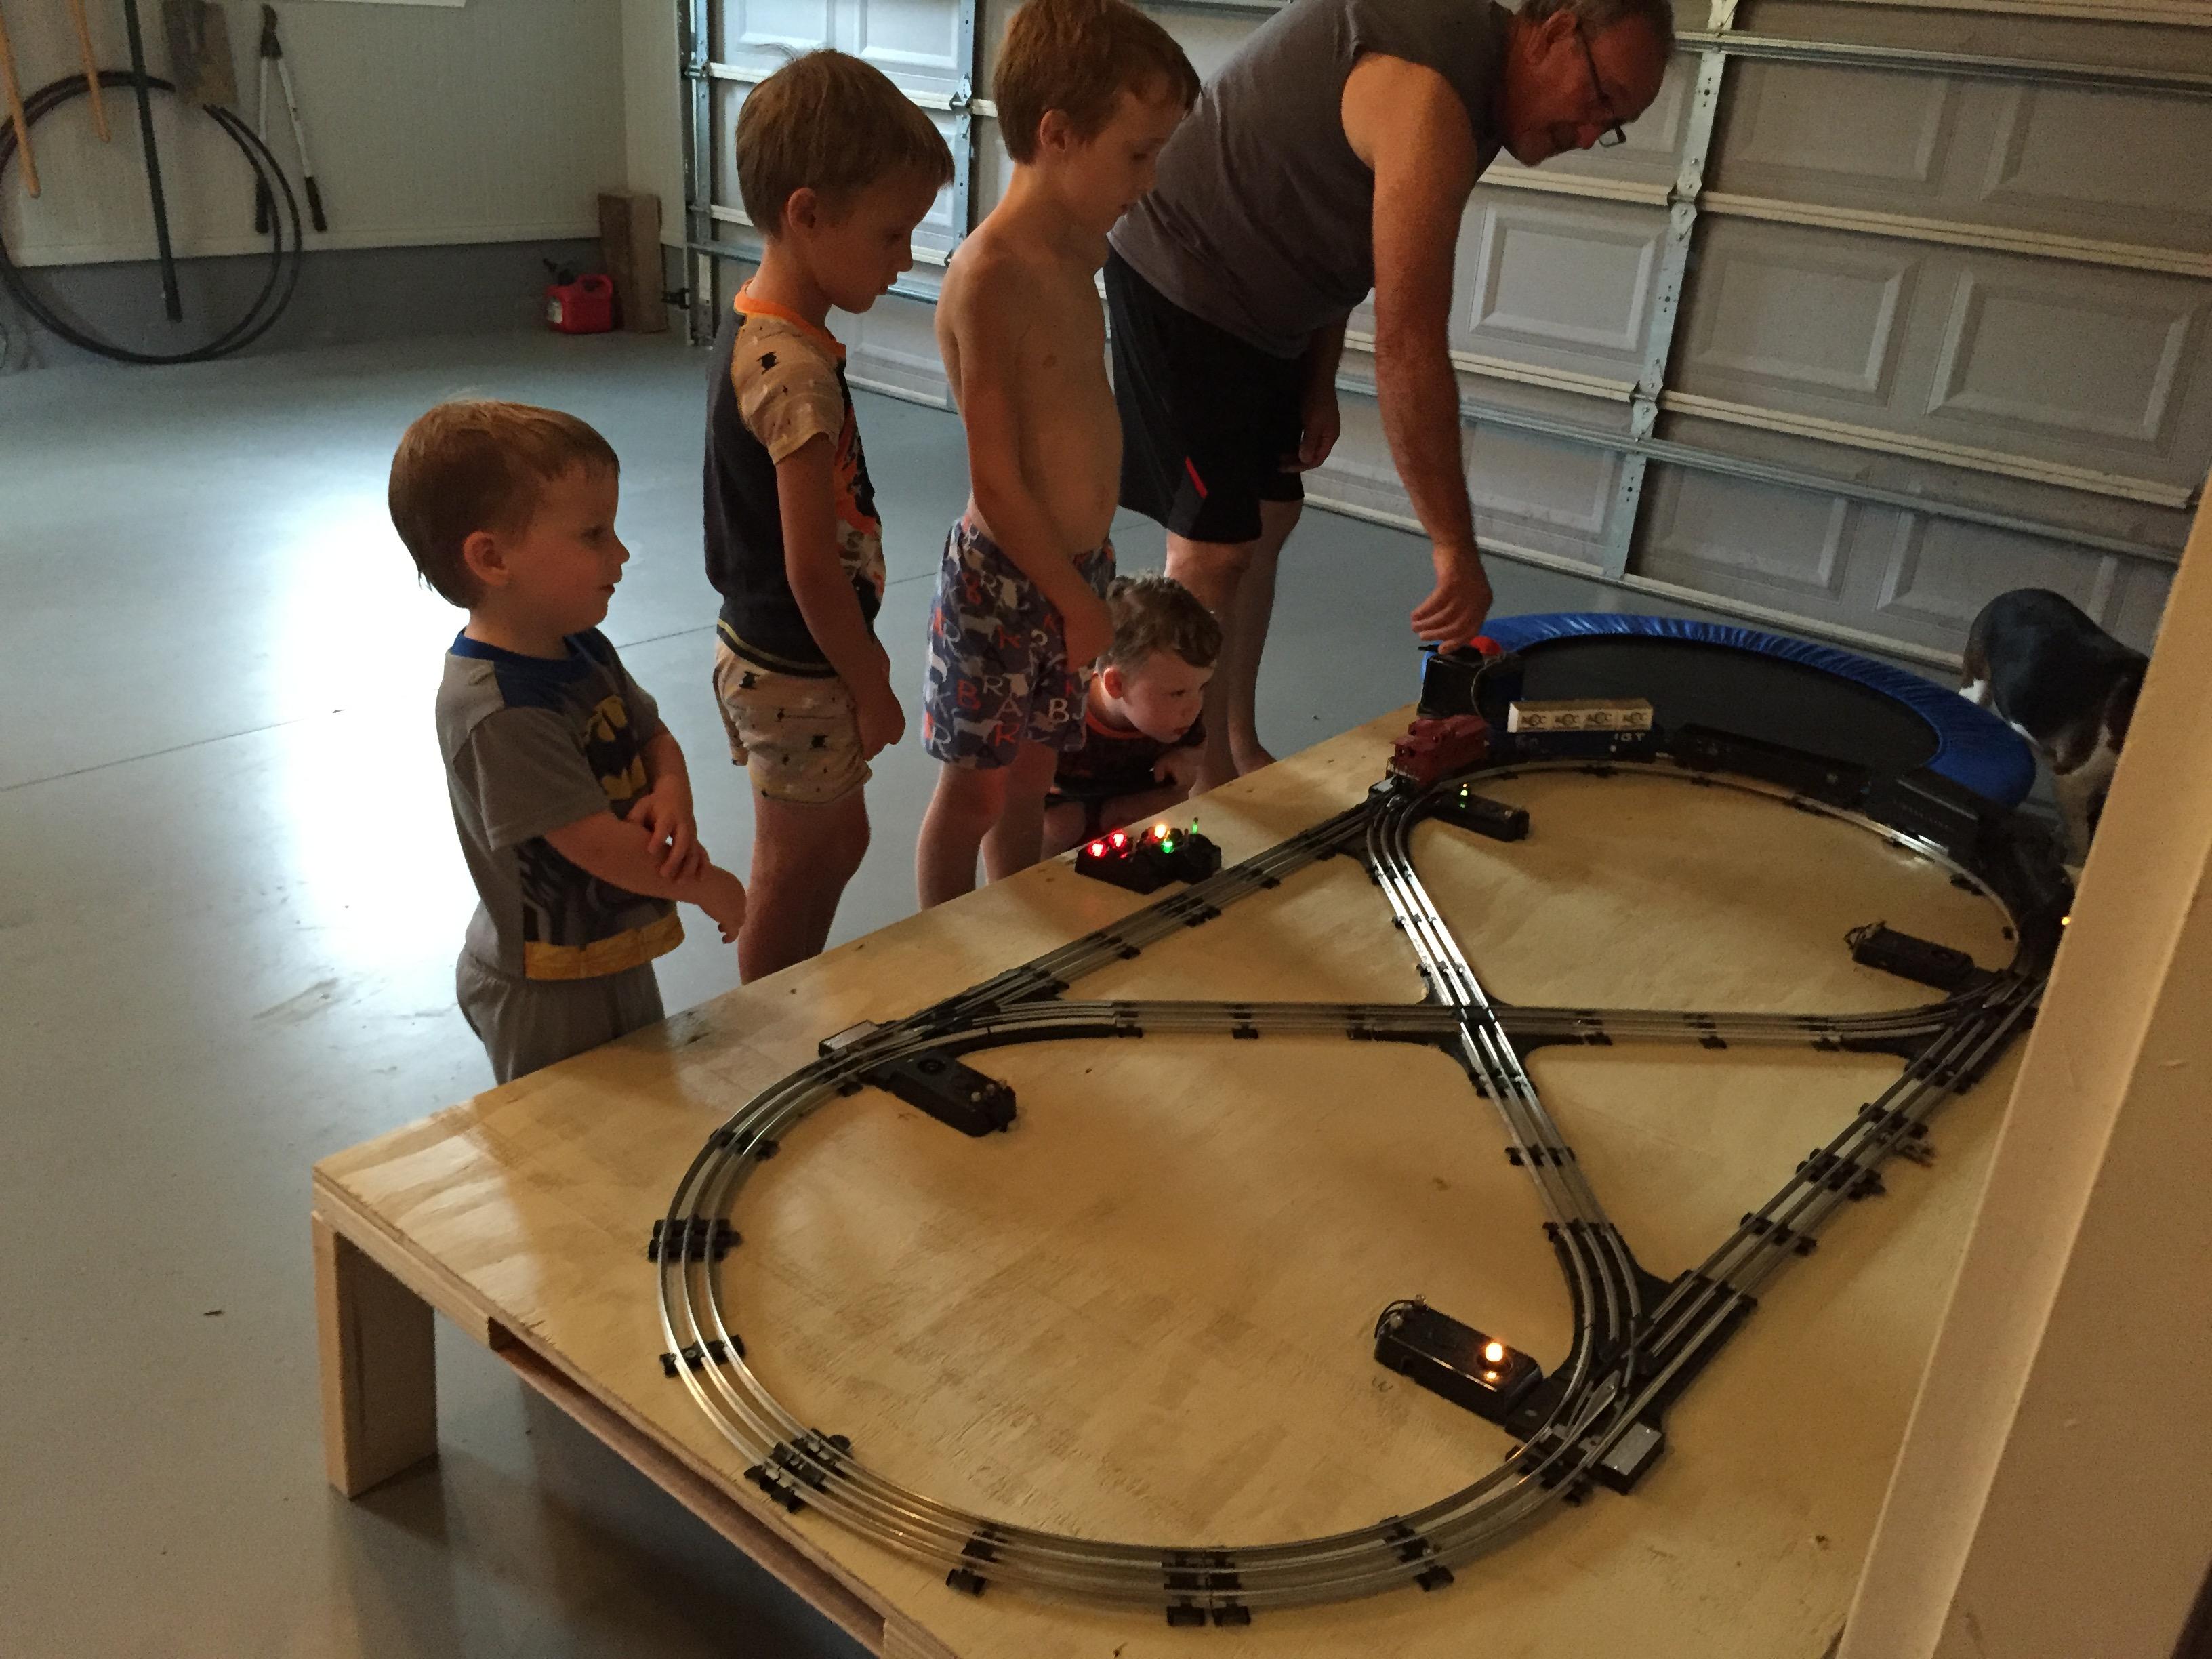 Pop's old Lionel train